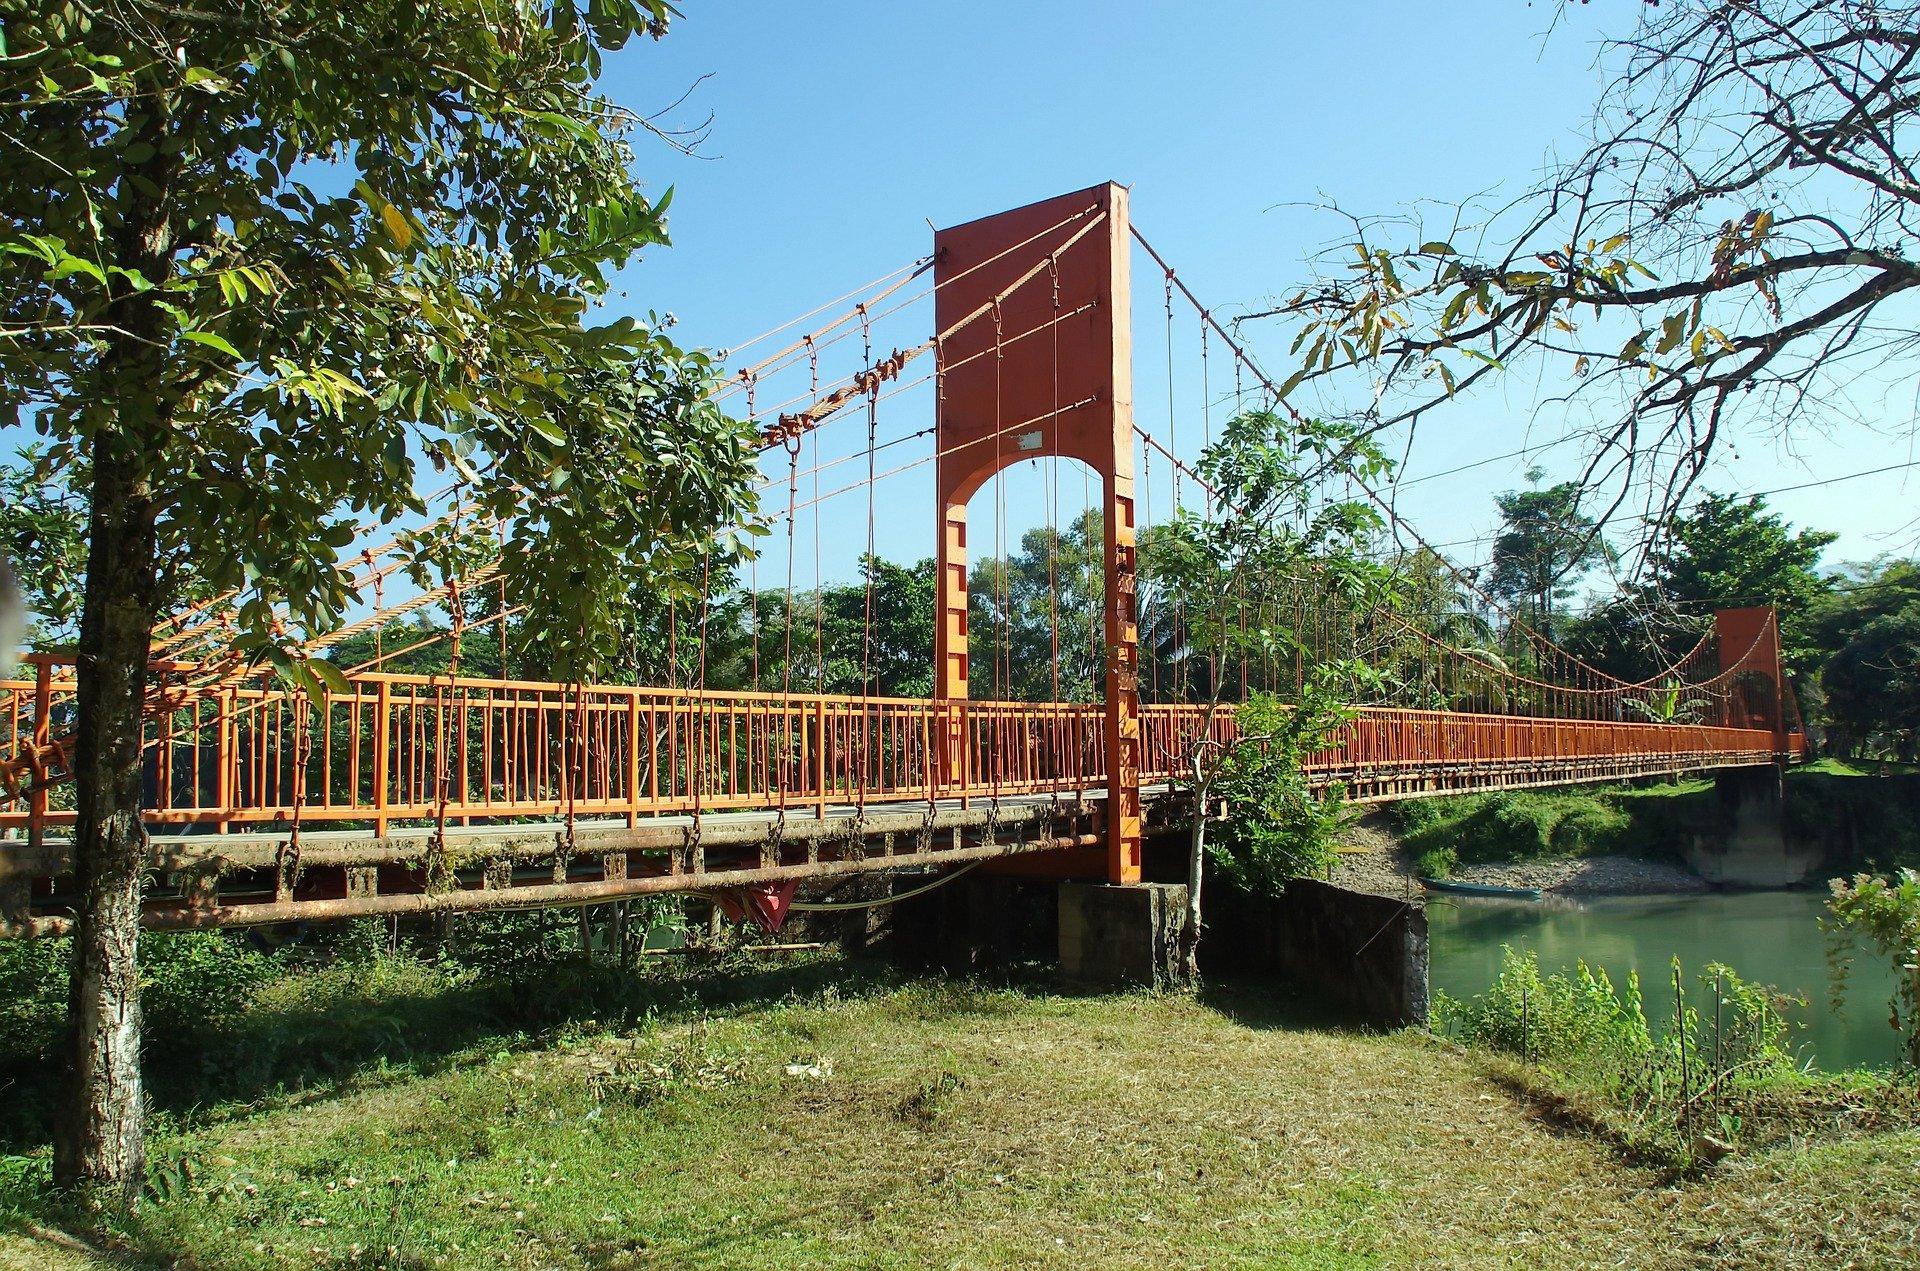 Vang Vieng Suspension Bridge